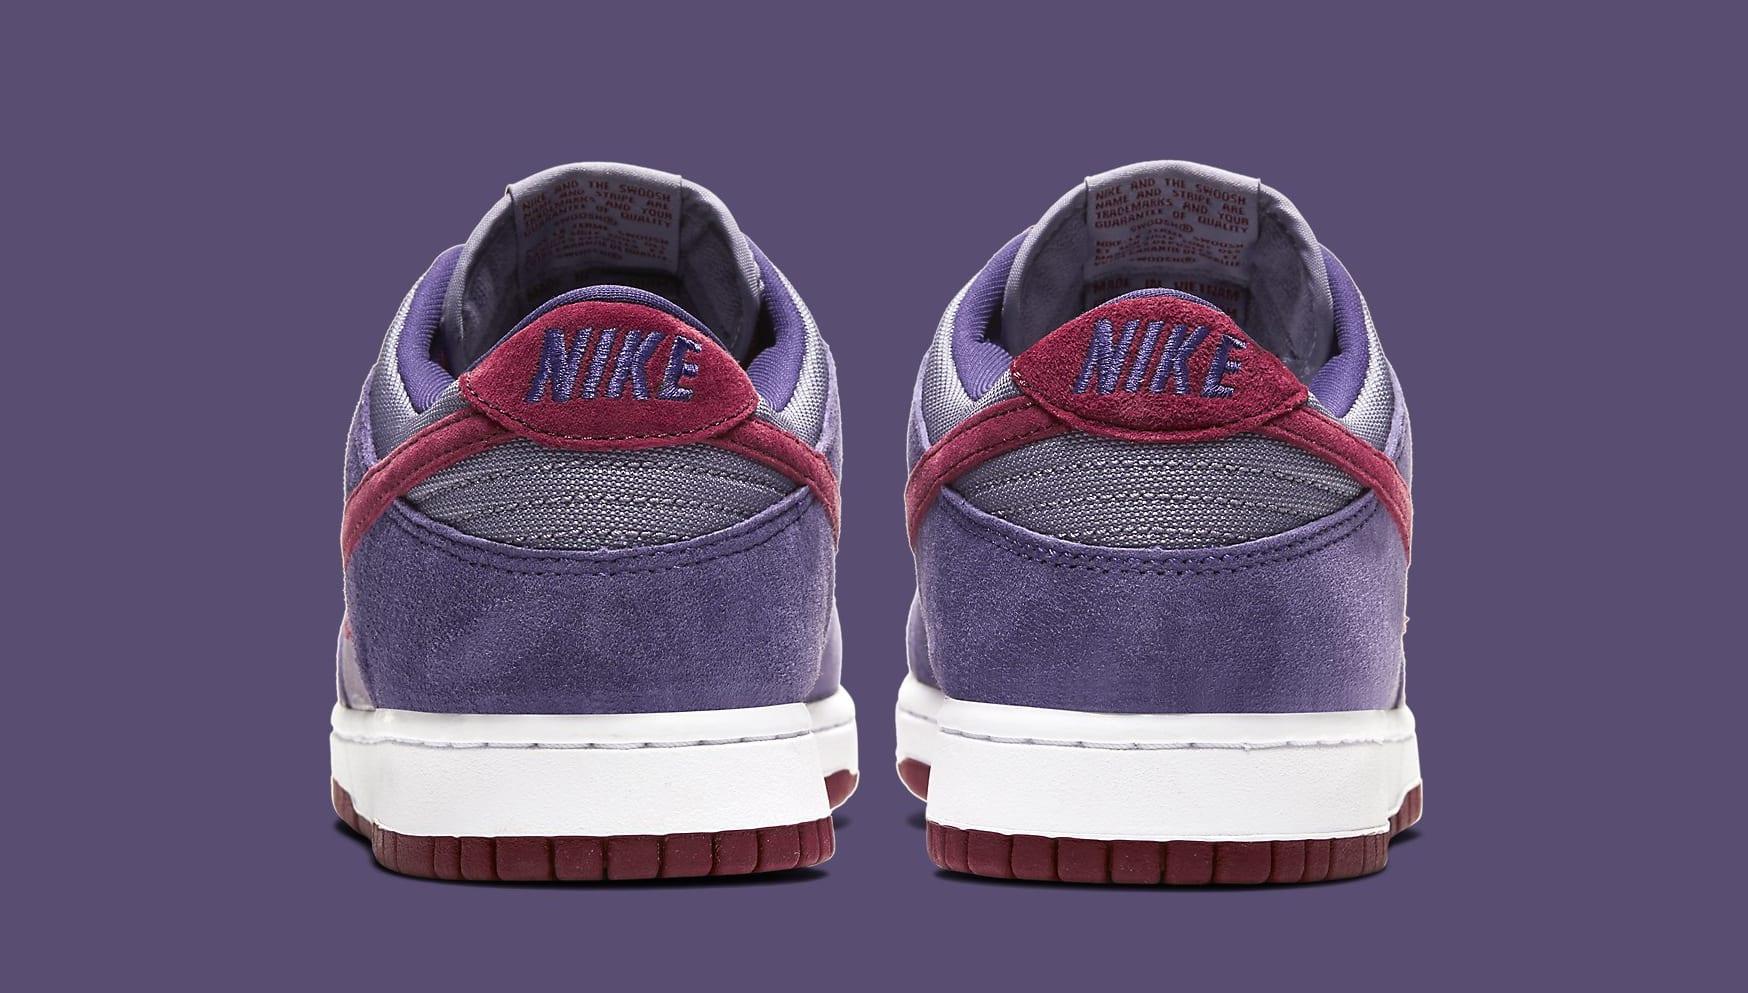 nike-dunk-low-plum-2020-cu1726-500-heel